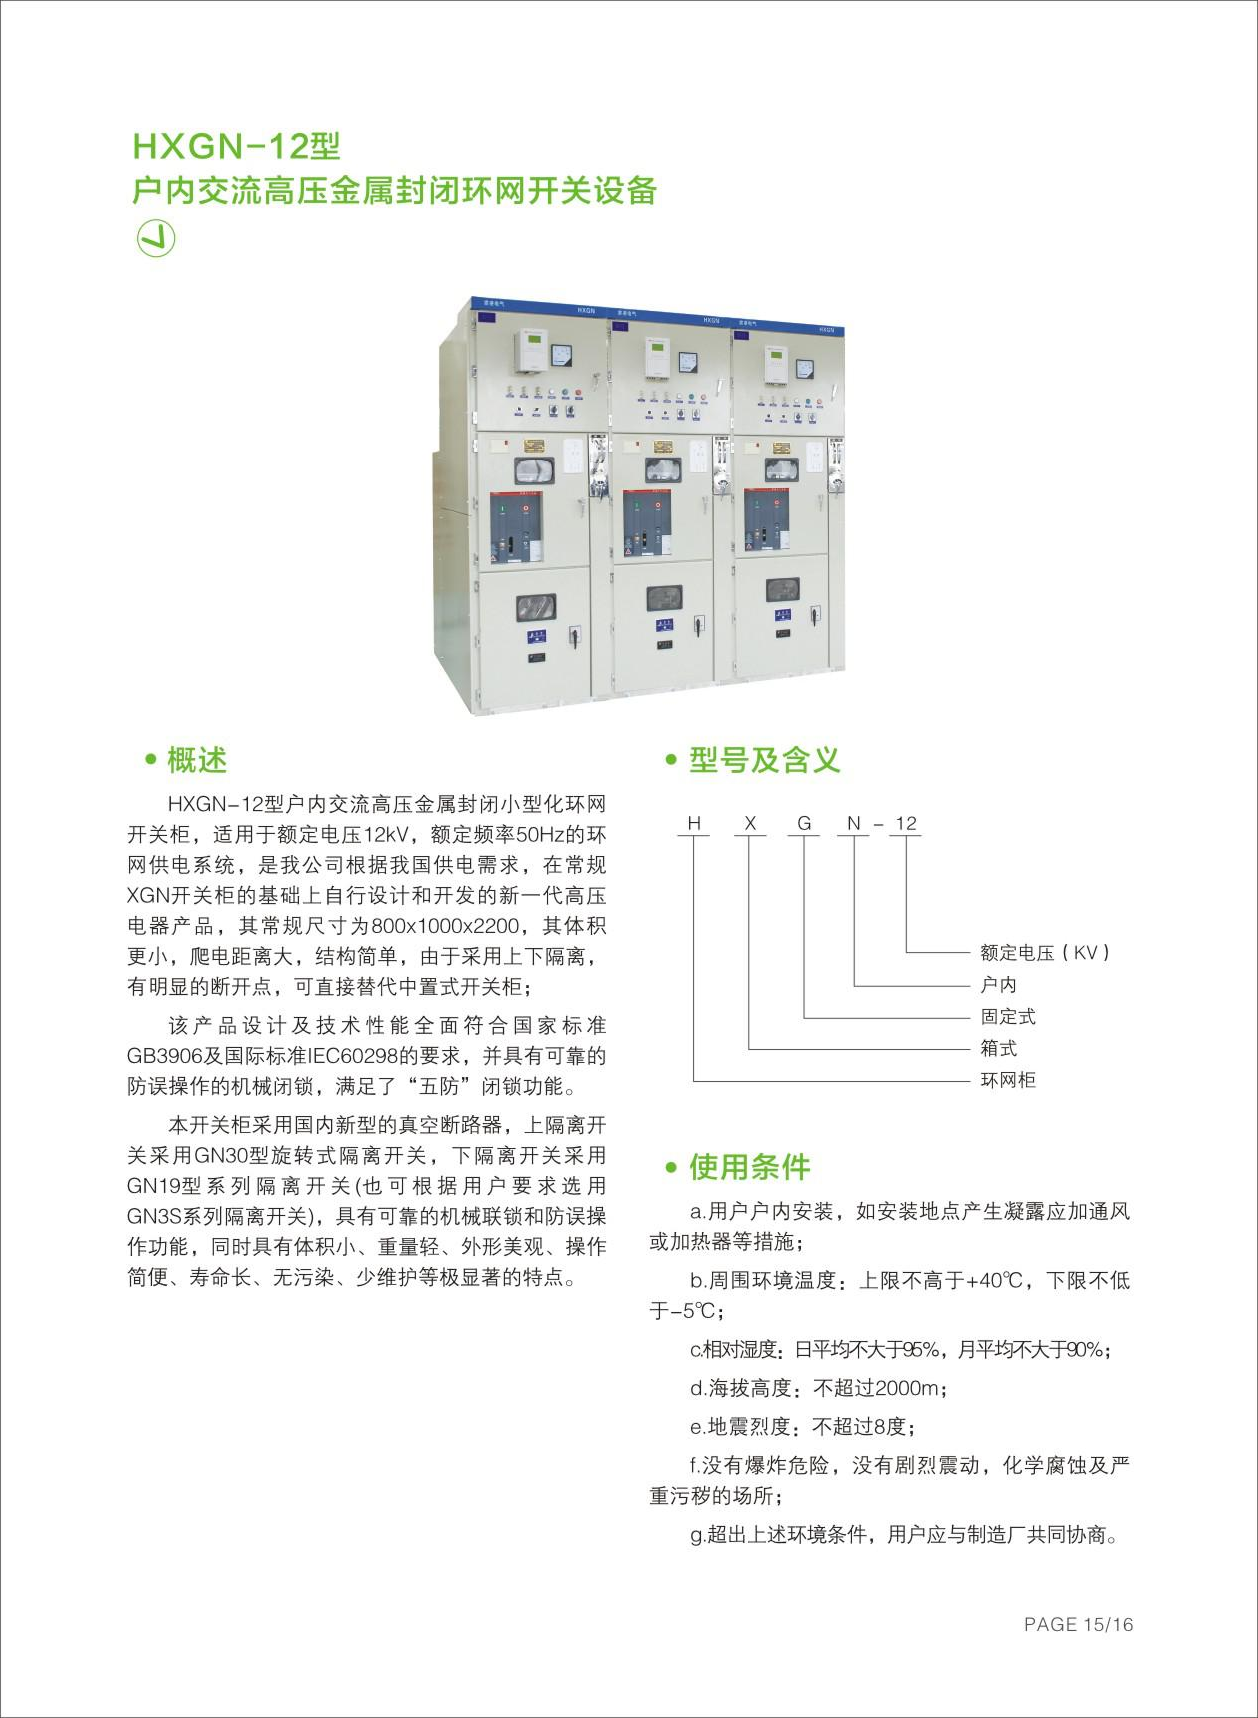 HXGN-12型户内交流高压金属封闭环网开关设备-图片